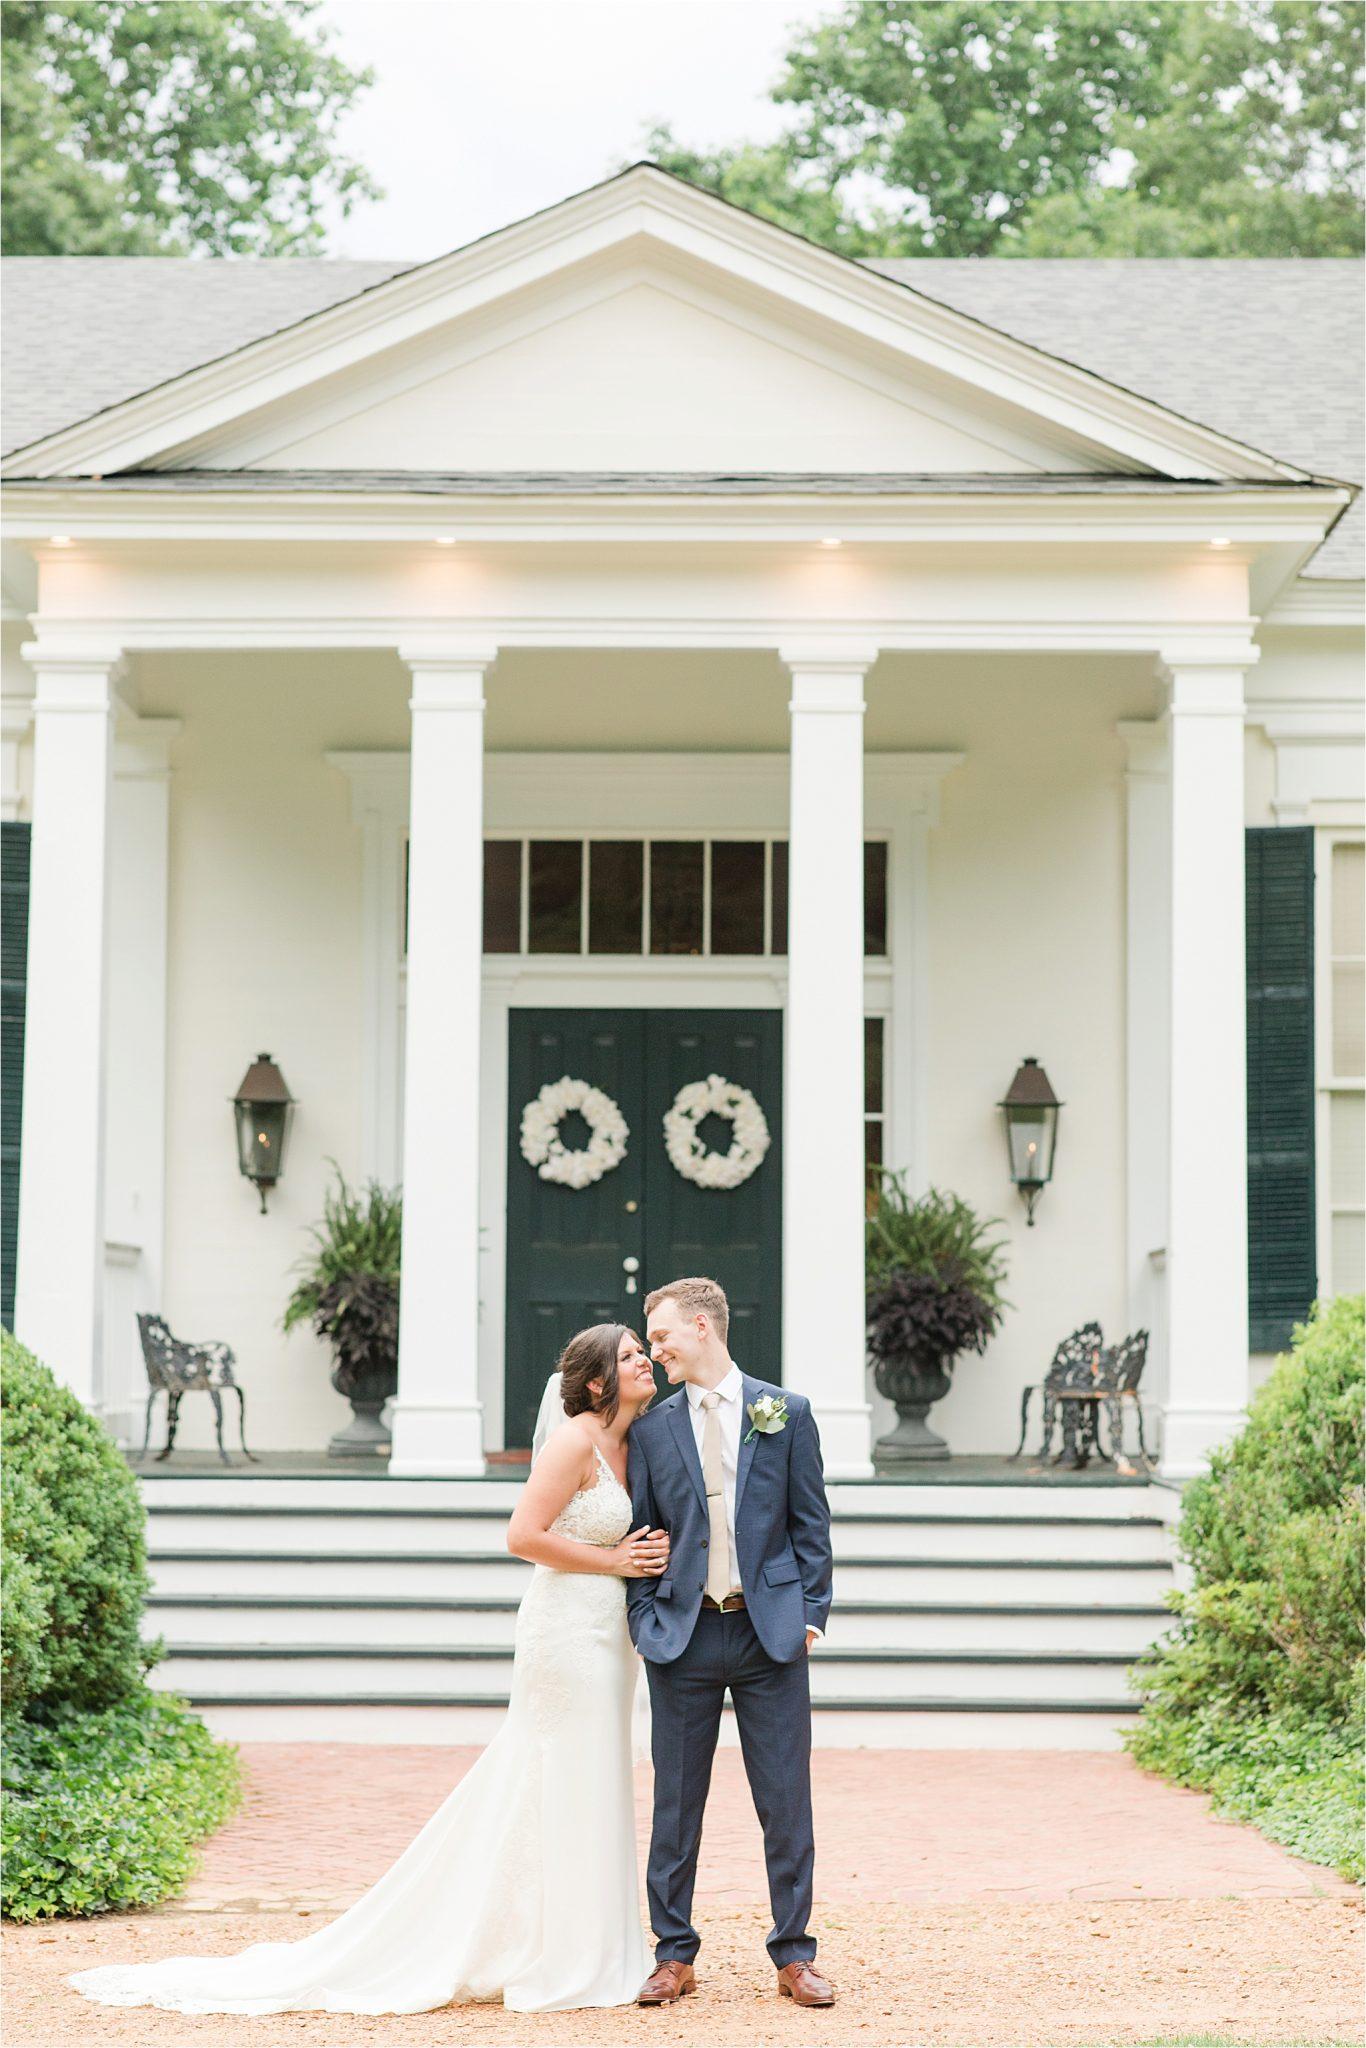 Mississippi wedding photographer   Hedge Farm Wedding   Alabama Wedding Photographer   the bride and groom